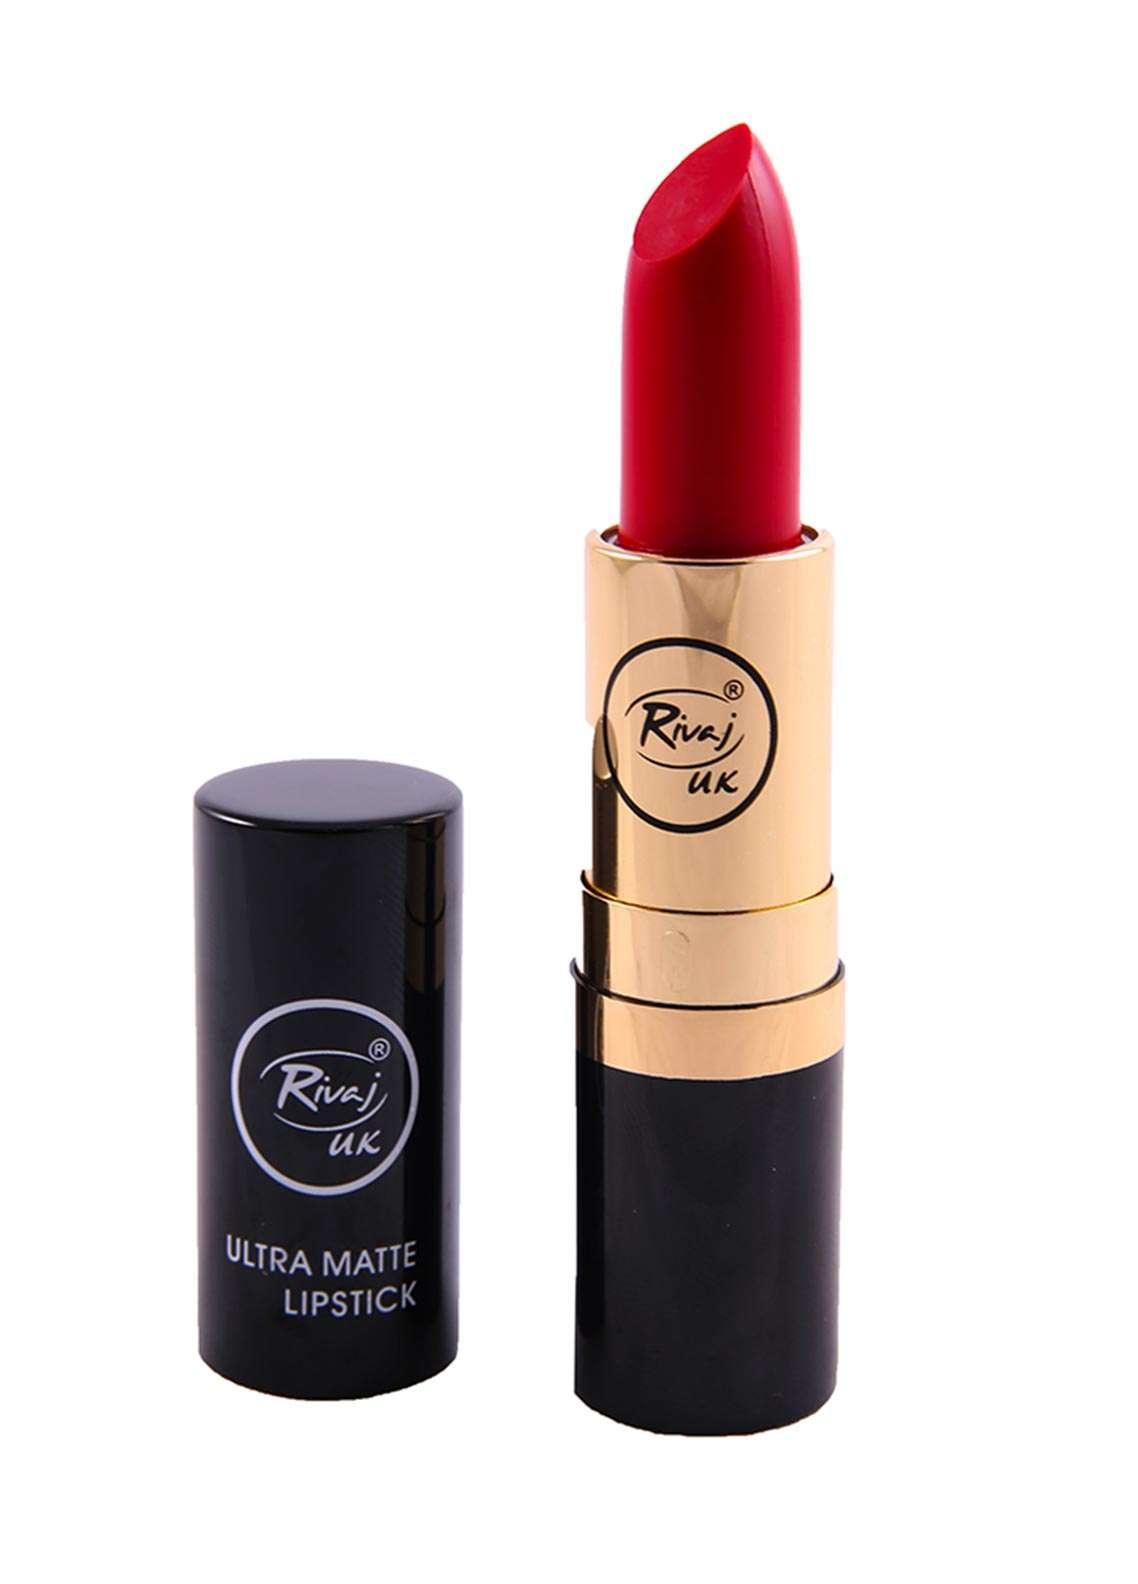 Rivaj UK Ultra Matte Lipstick - 13